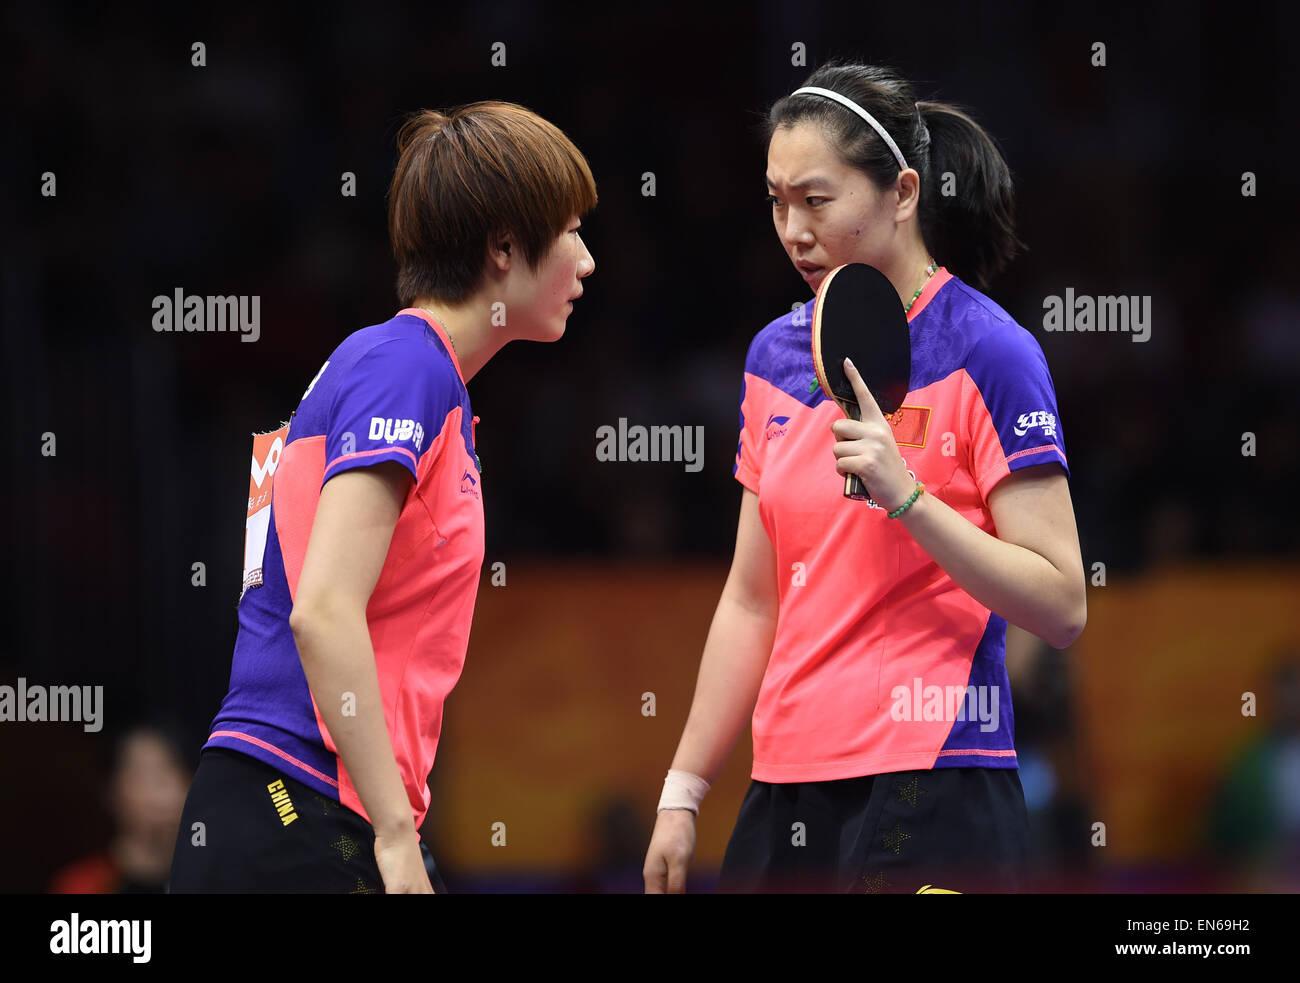 Ning li dating coach